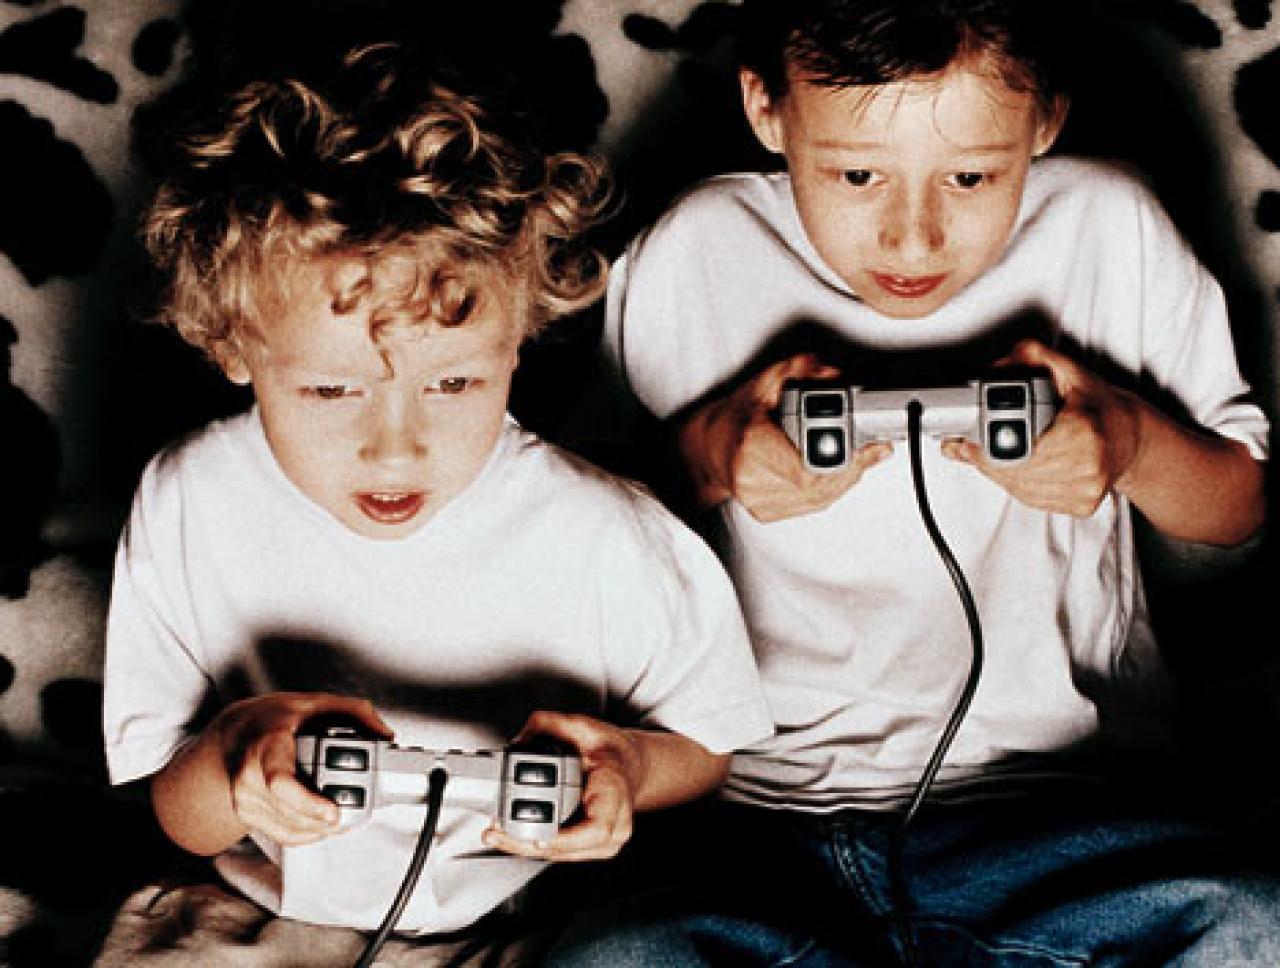 video games bad for kids essay